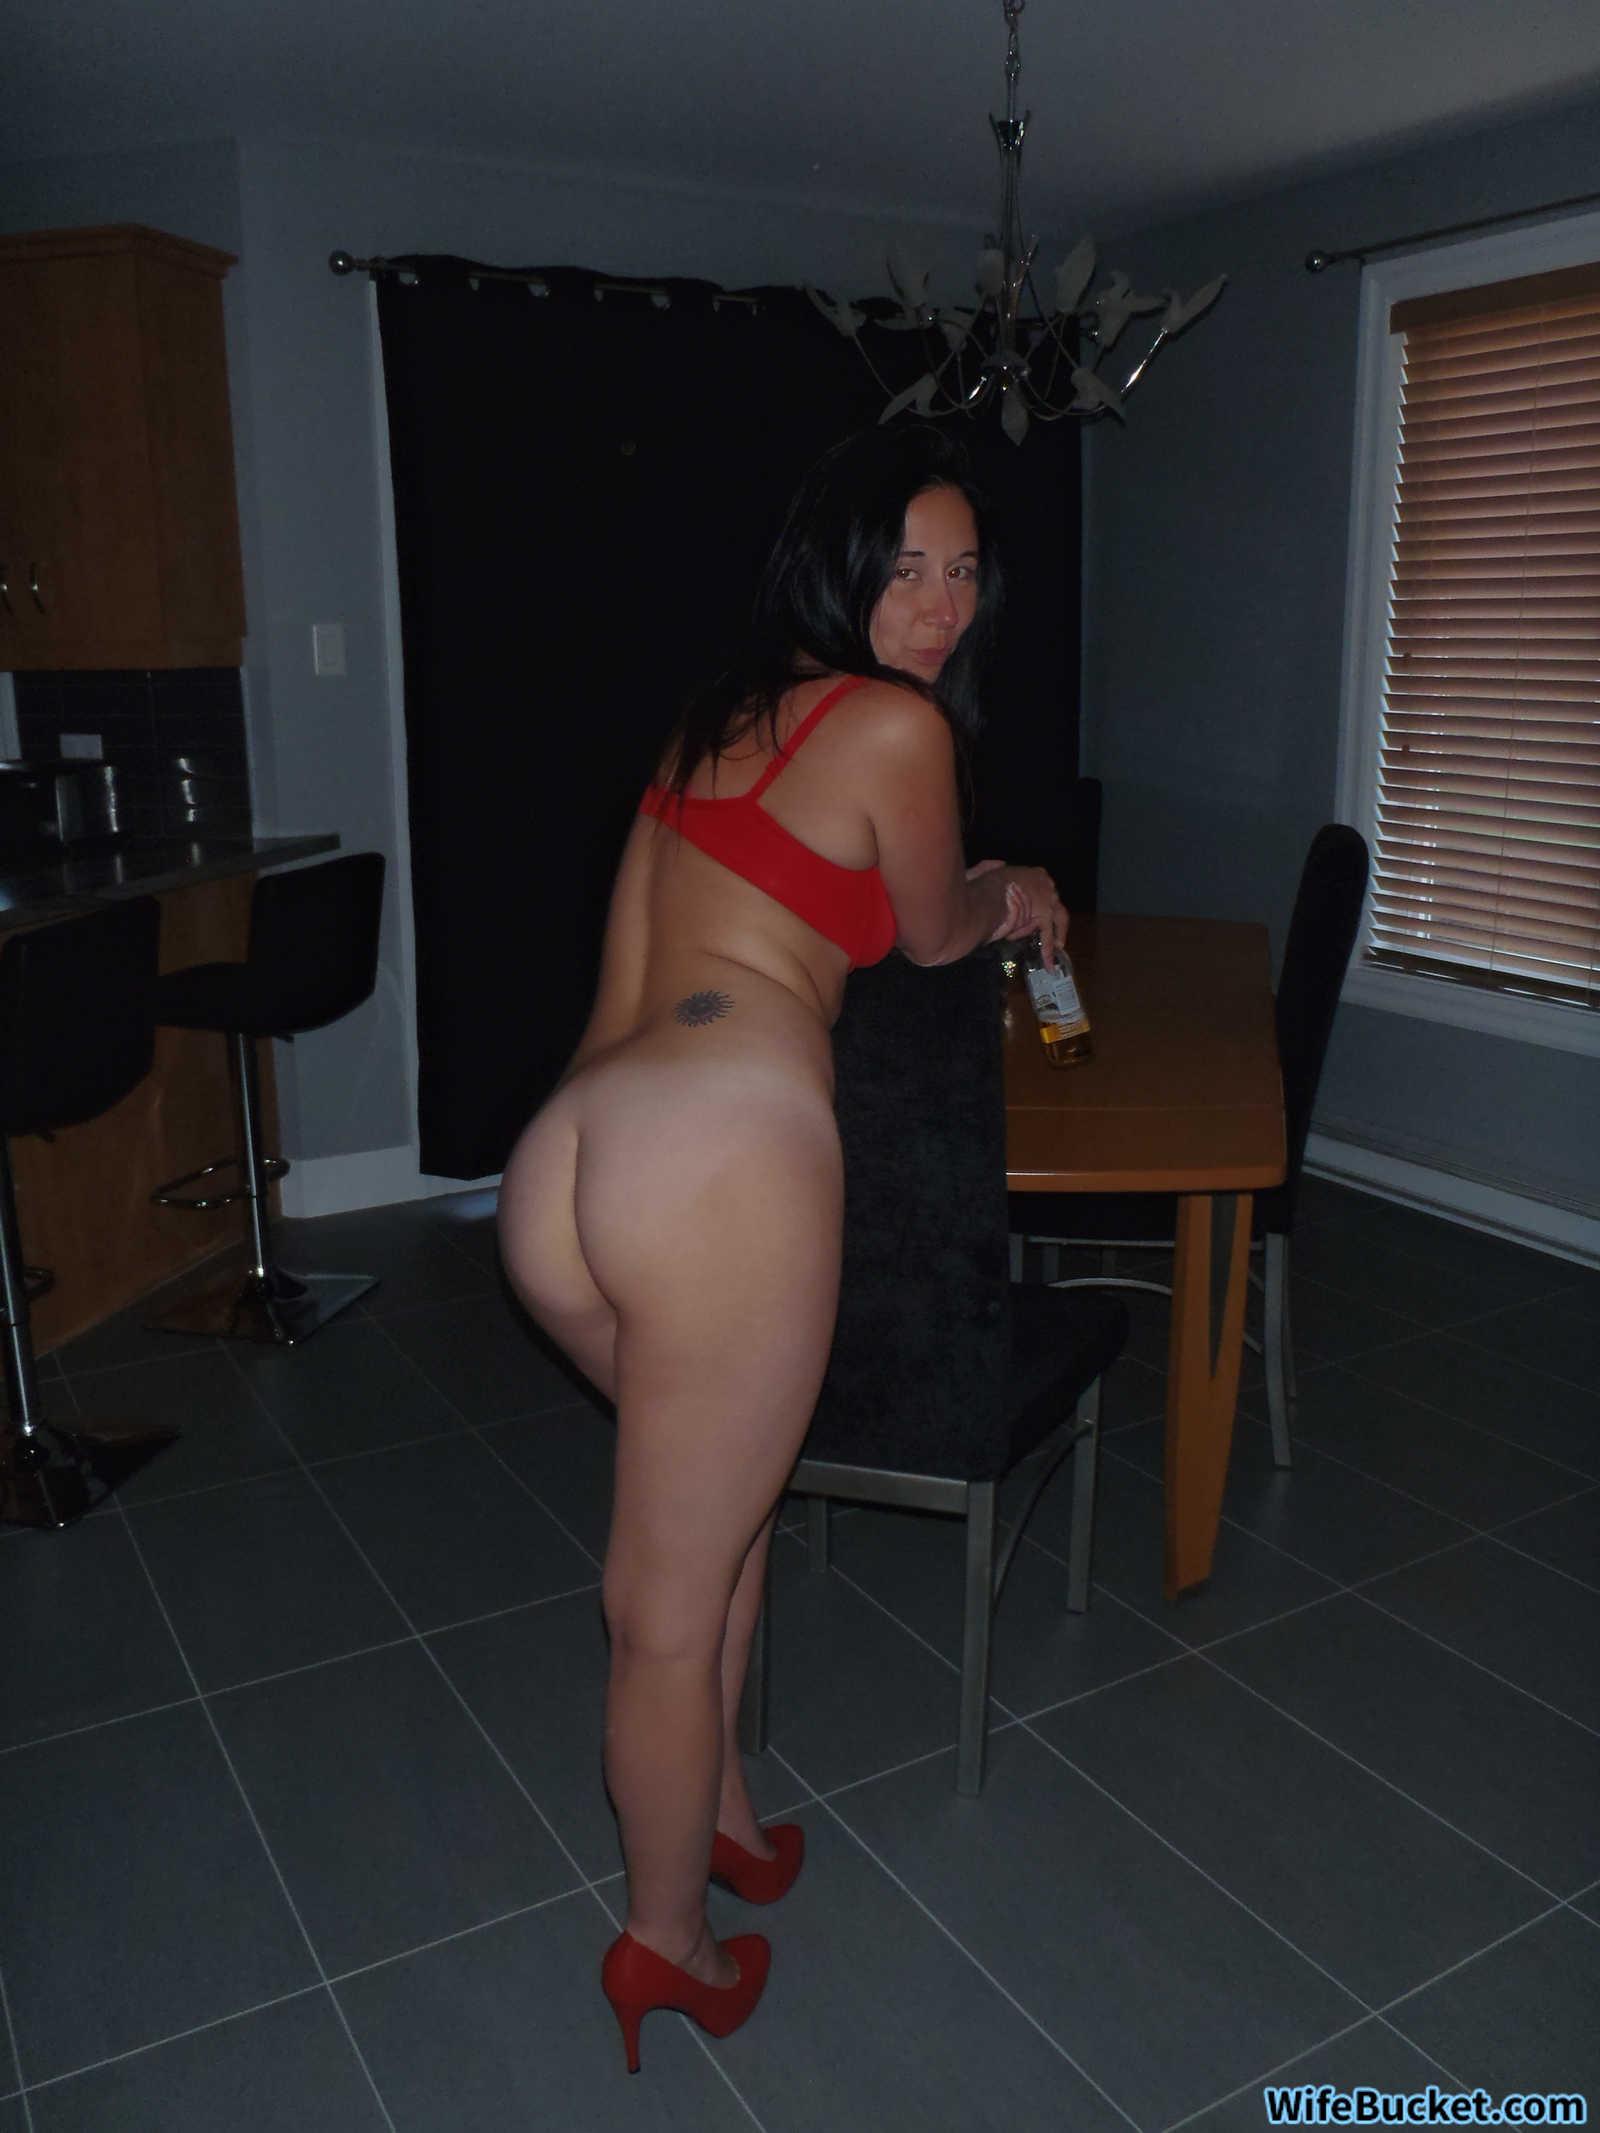 cassie nude having sex pictures